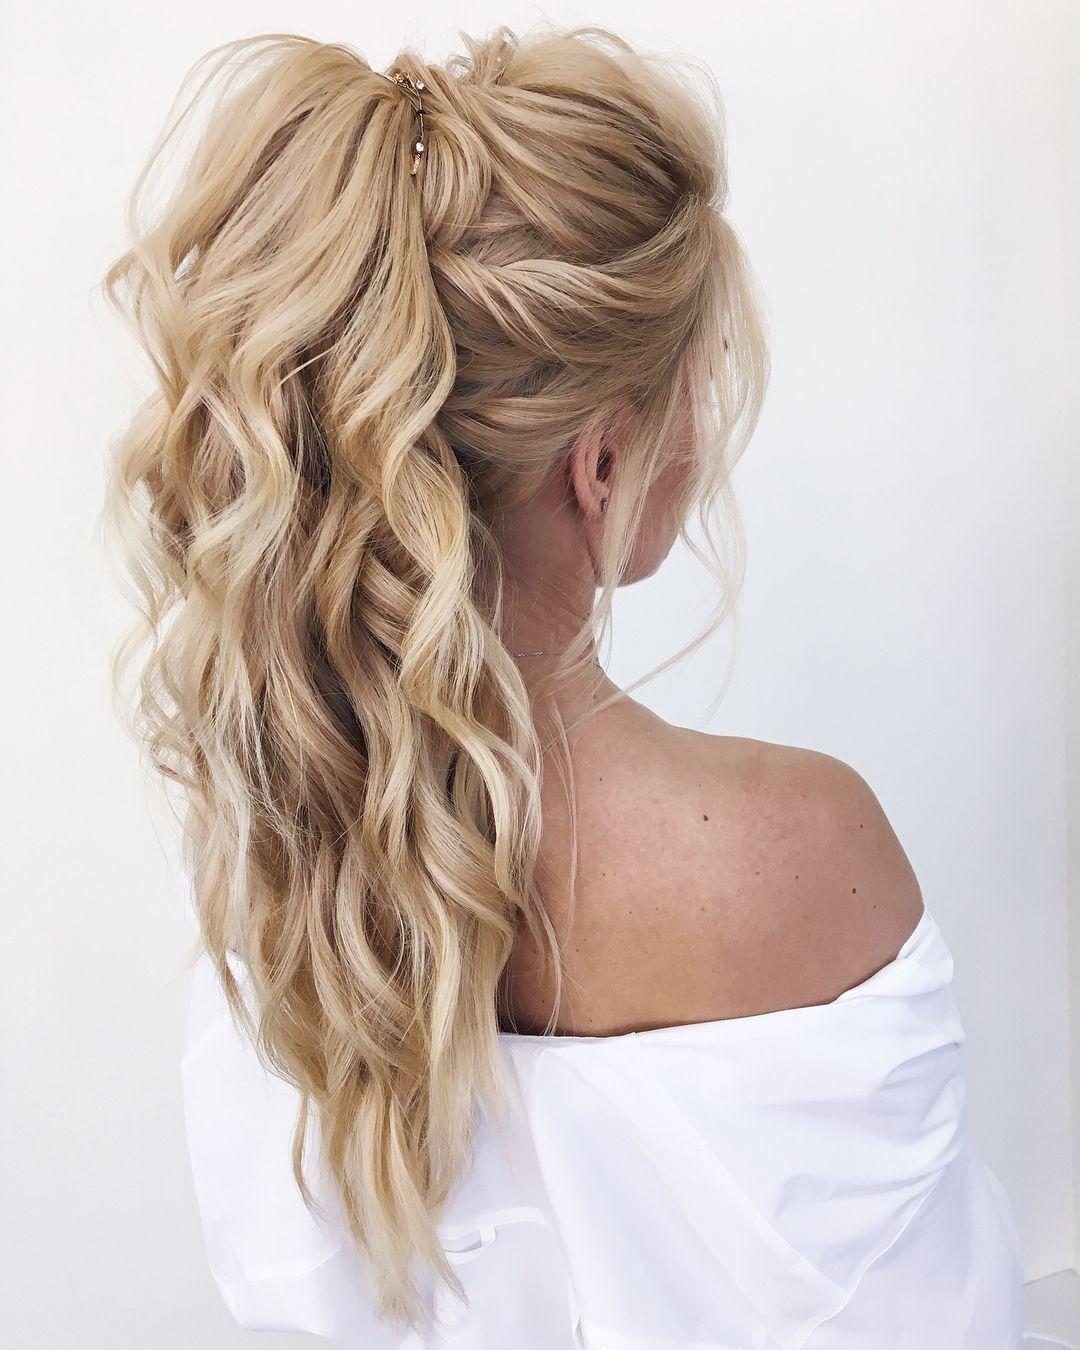 35 Genius Hairstyle Idea For Long And Straight Hair Noivas Dicasdenoivas Vestidosdenoivas Wedding Hairstyles For Long Hair Long Hair Styles Hair Styles